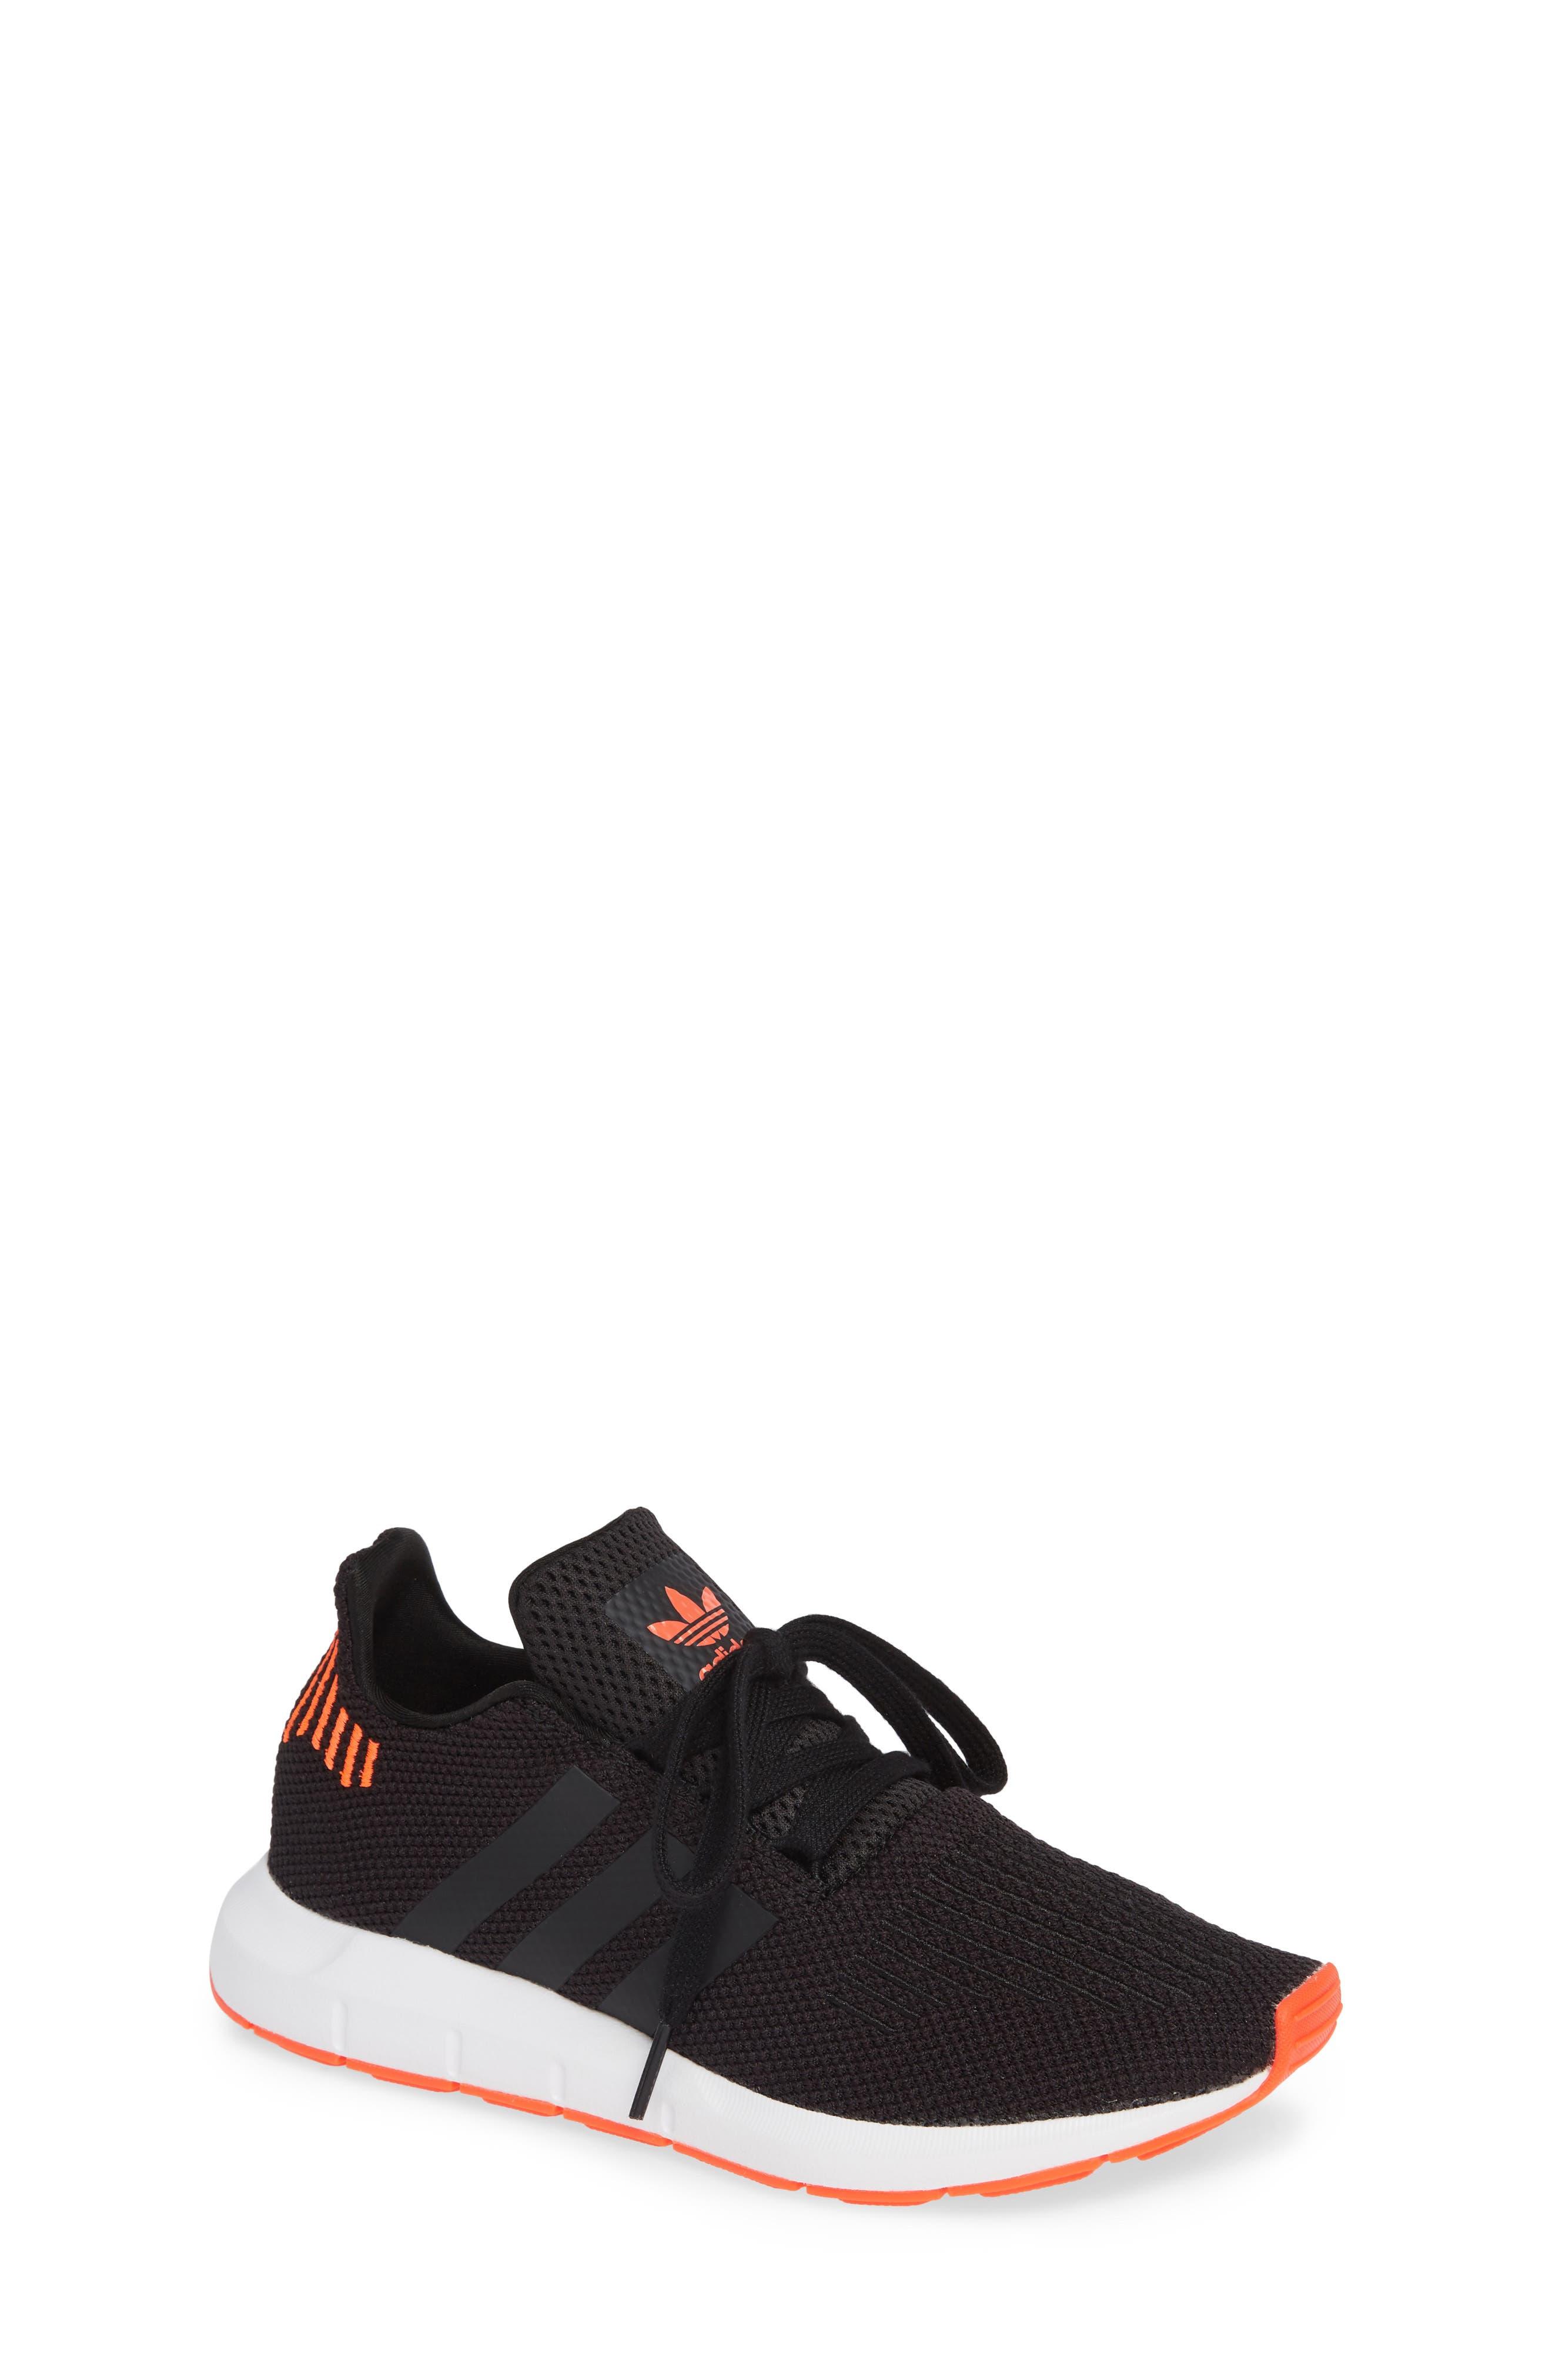 Swift Run J Sneaker,                             Main thumbnail 1, color,                             BLACK/ BLACK/ SOLAR RED